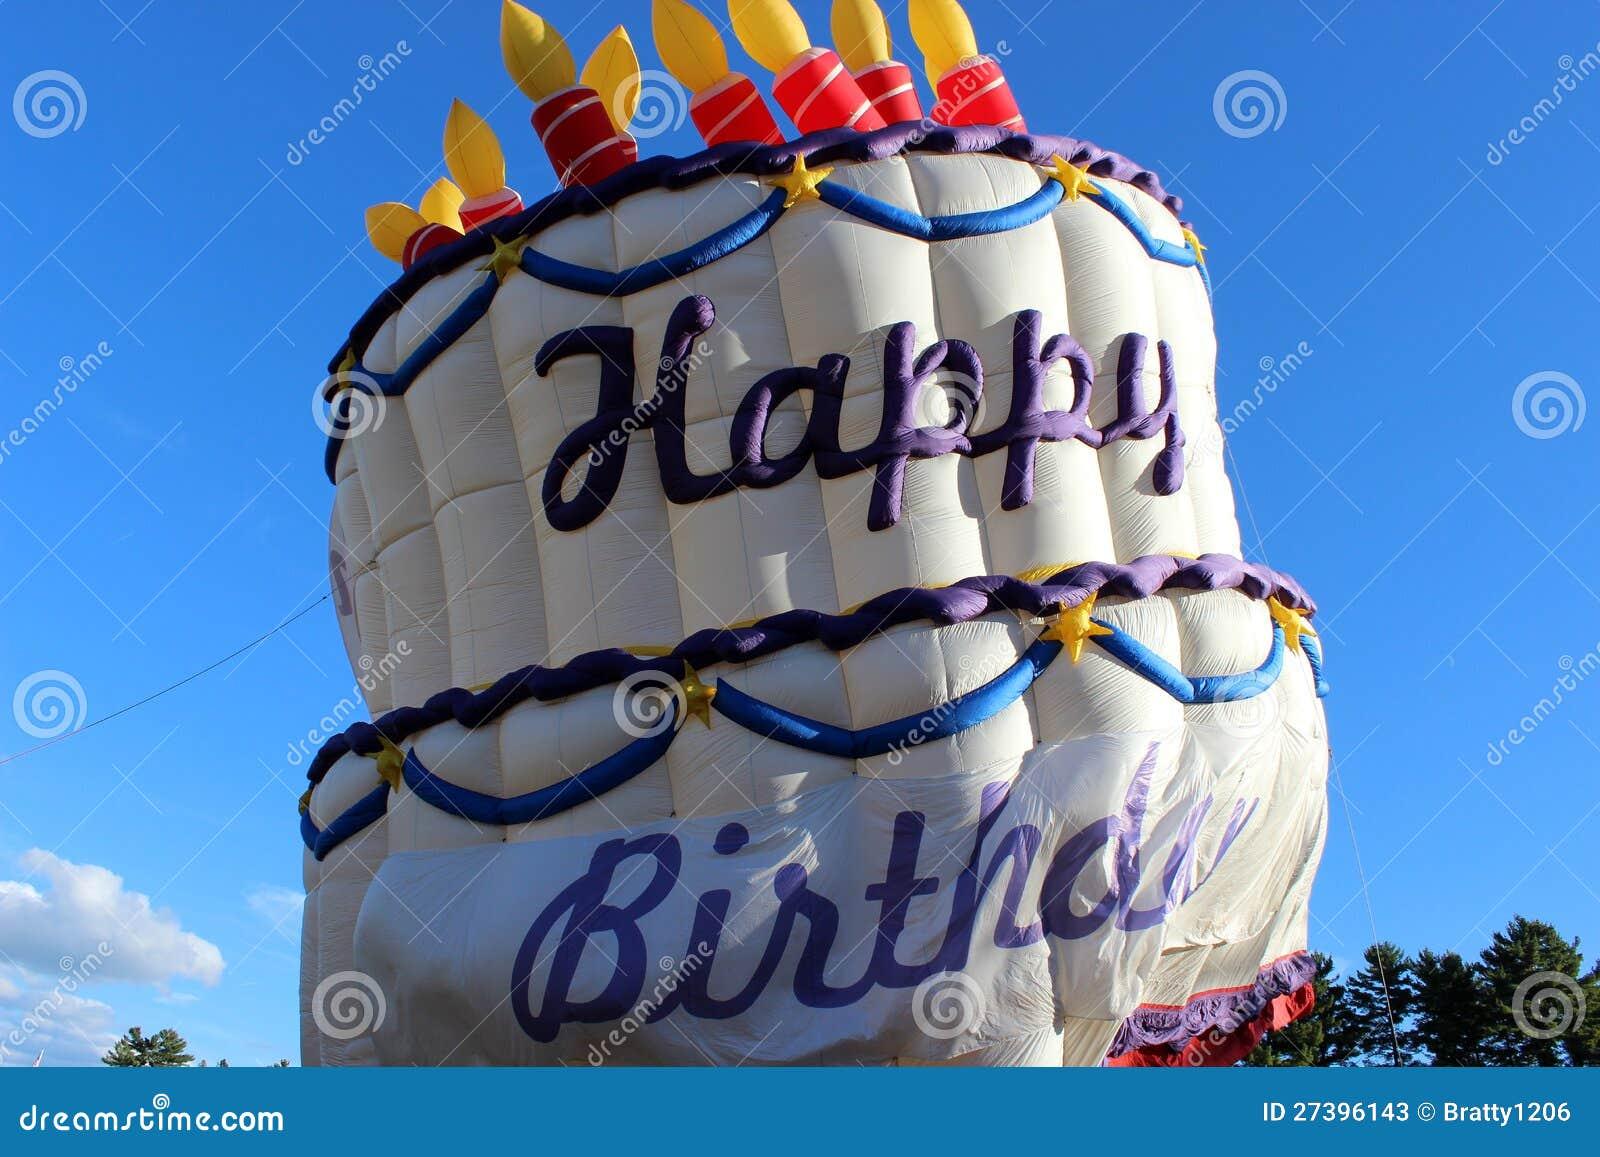 Happy Birthday Cake Hot Air Balloon